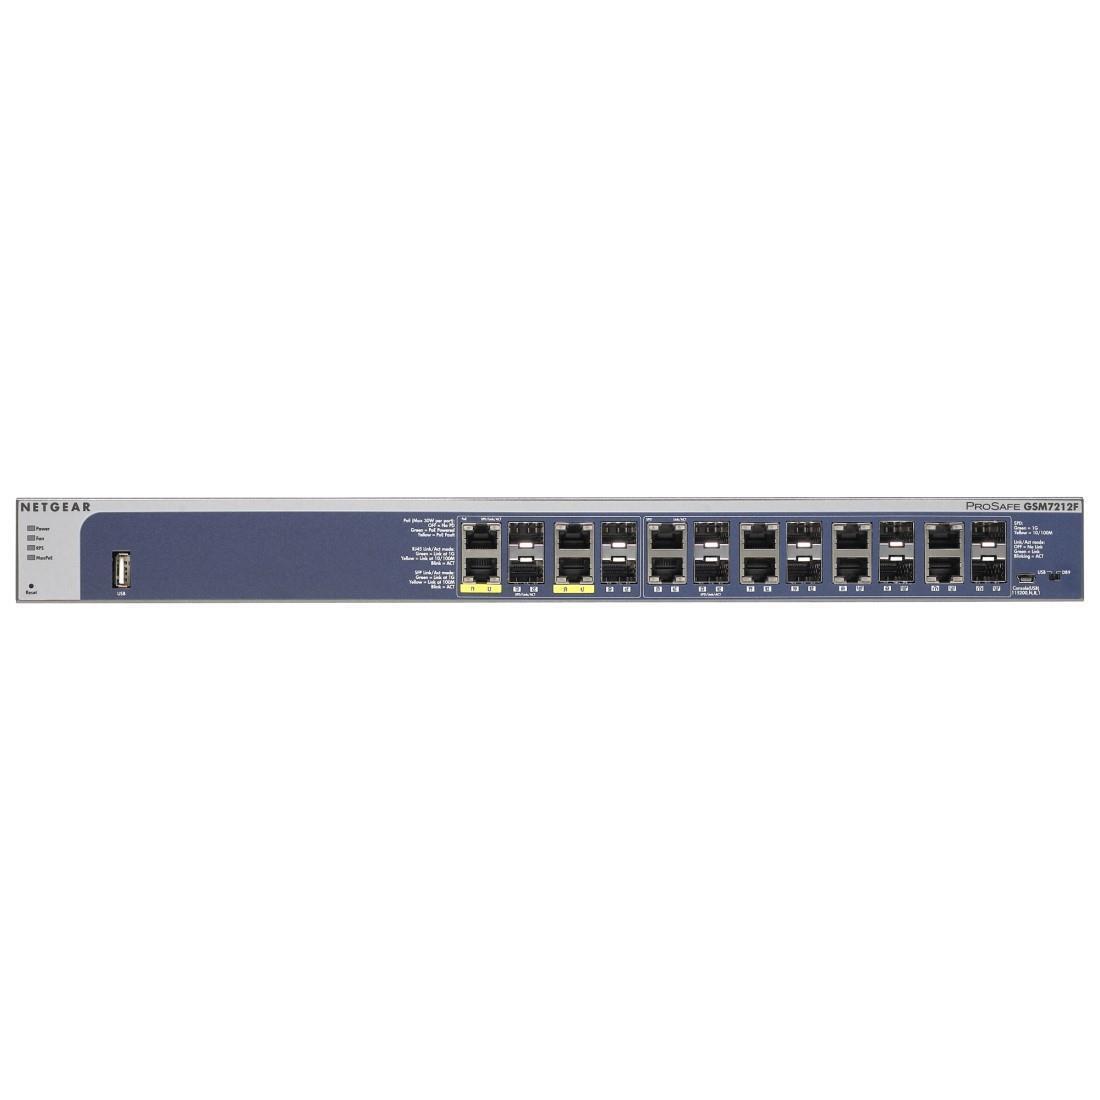 Netgear ProSafe GSM7212F-100NES - 12 Port Gigabit Fiber Layer 2 Managed Switch